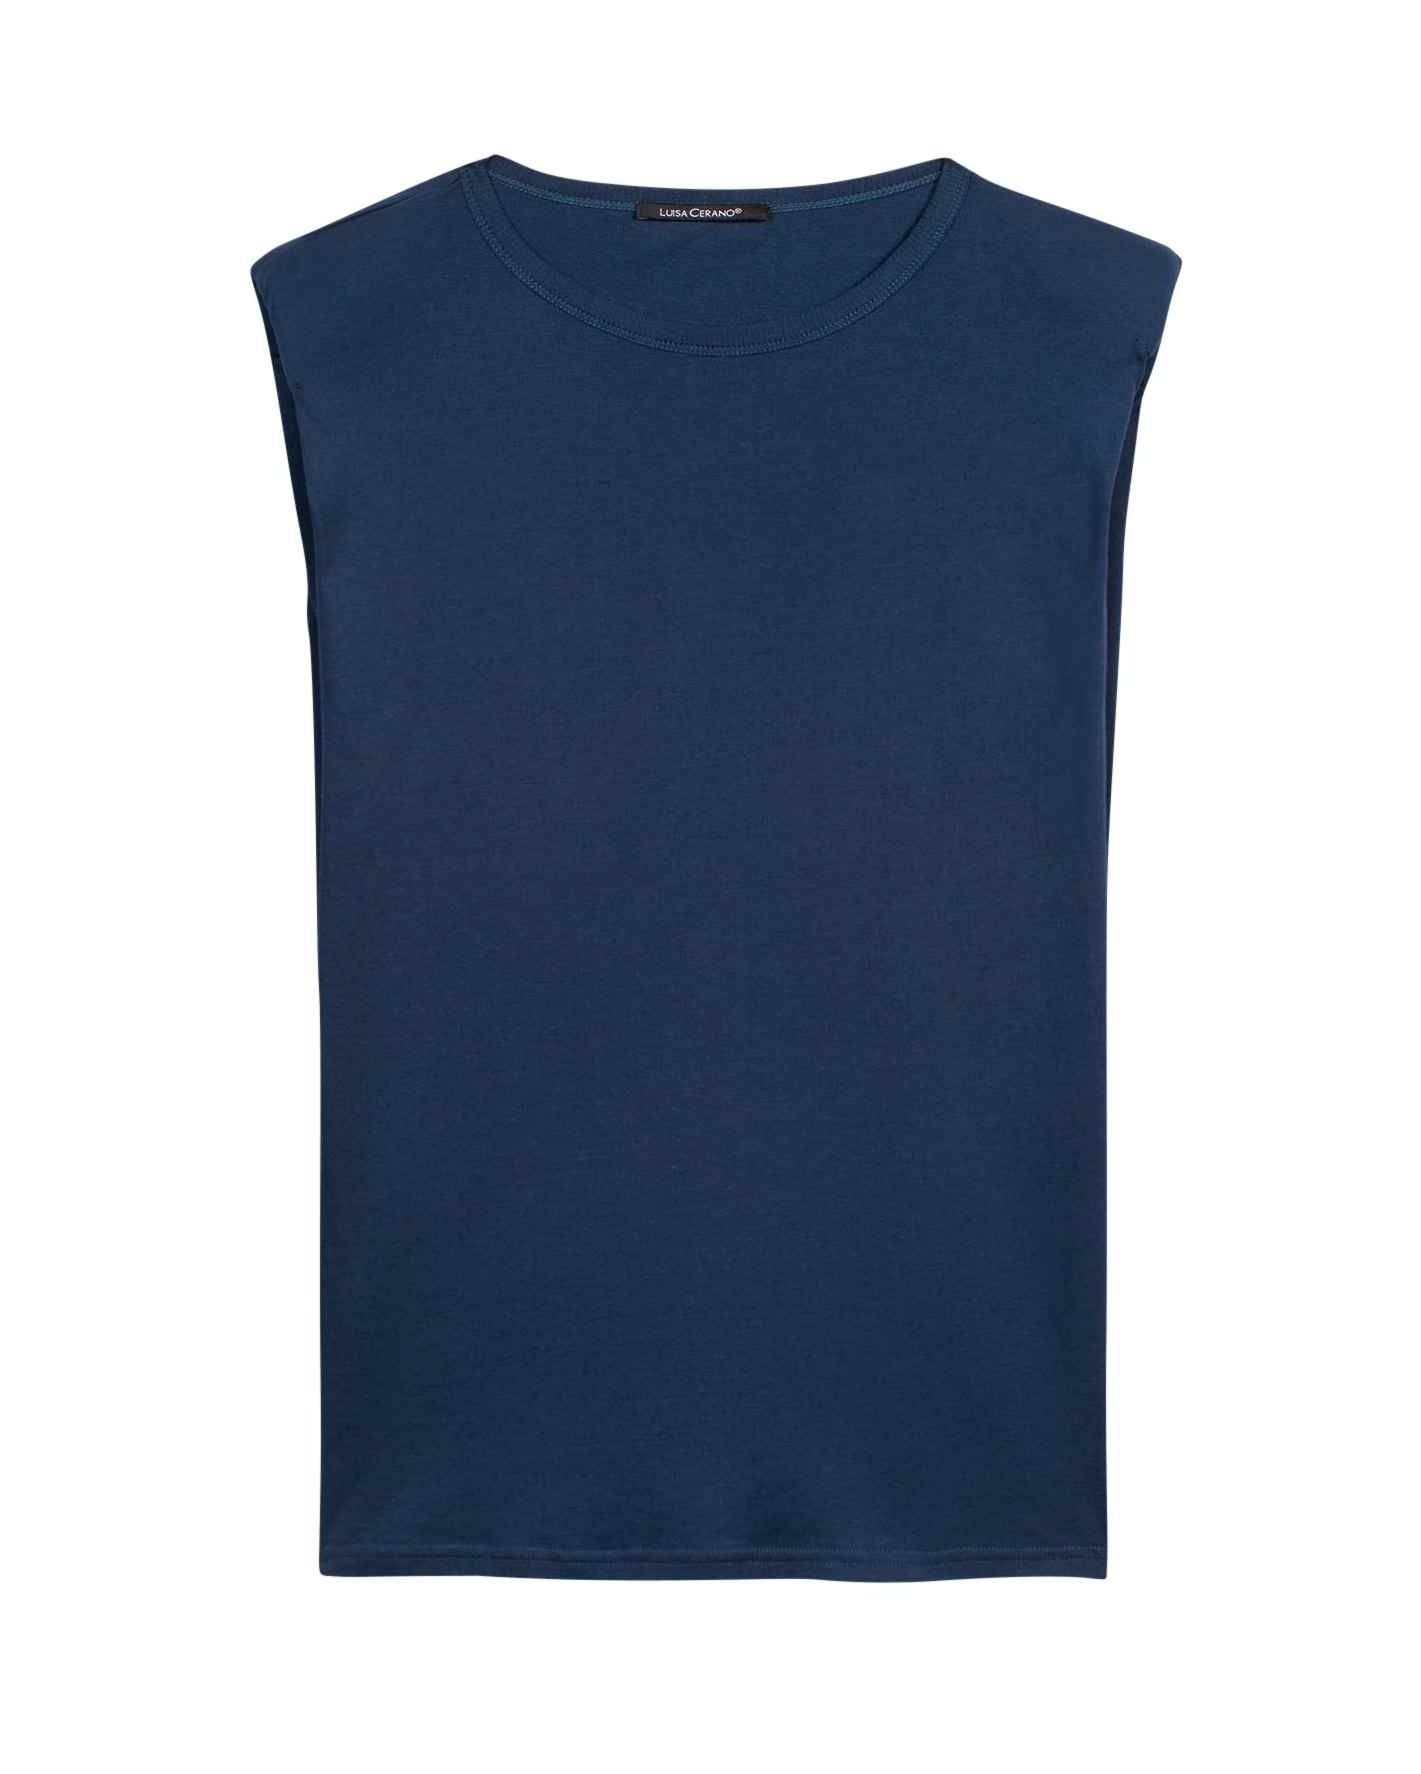 LUISA CERANO - Damen T-Shirt - T-Shirt mit Schulterbetonung - Ink